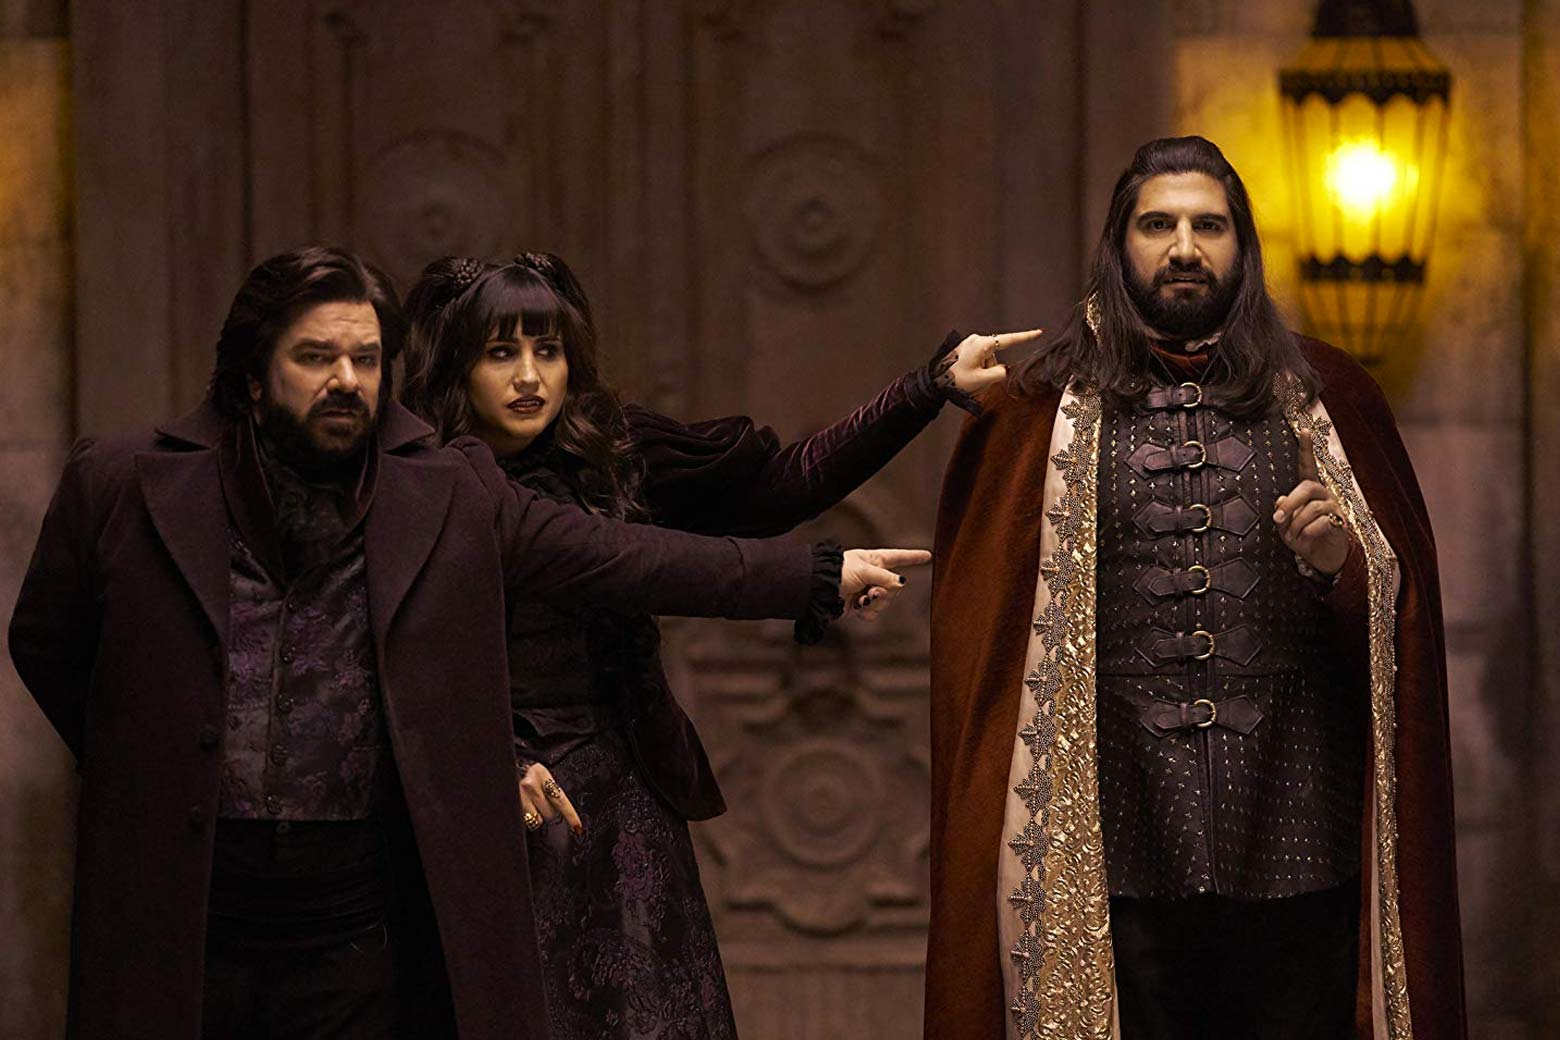 Matt Berry, Natasia Demetriou, and Kayvan Novak as the vampires Laszlo, Nadja, and Nandor.